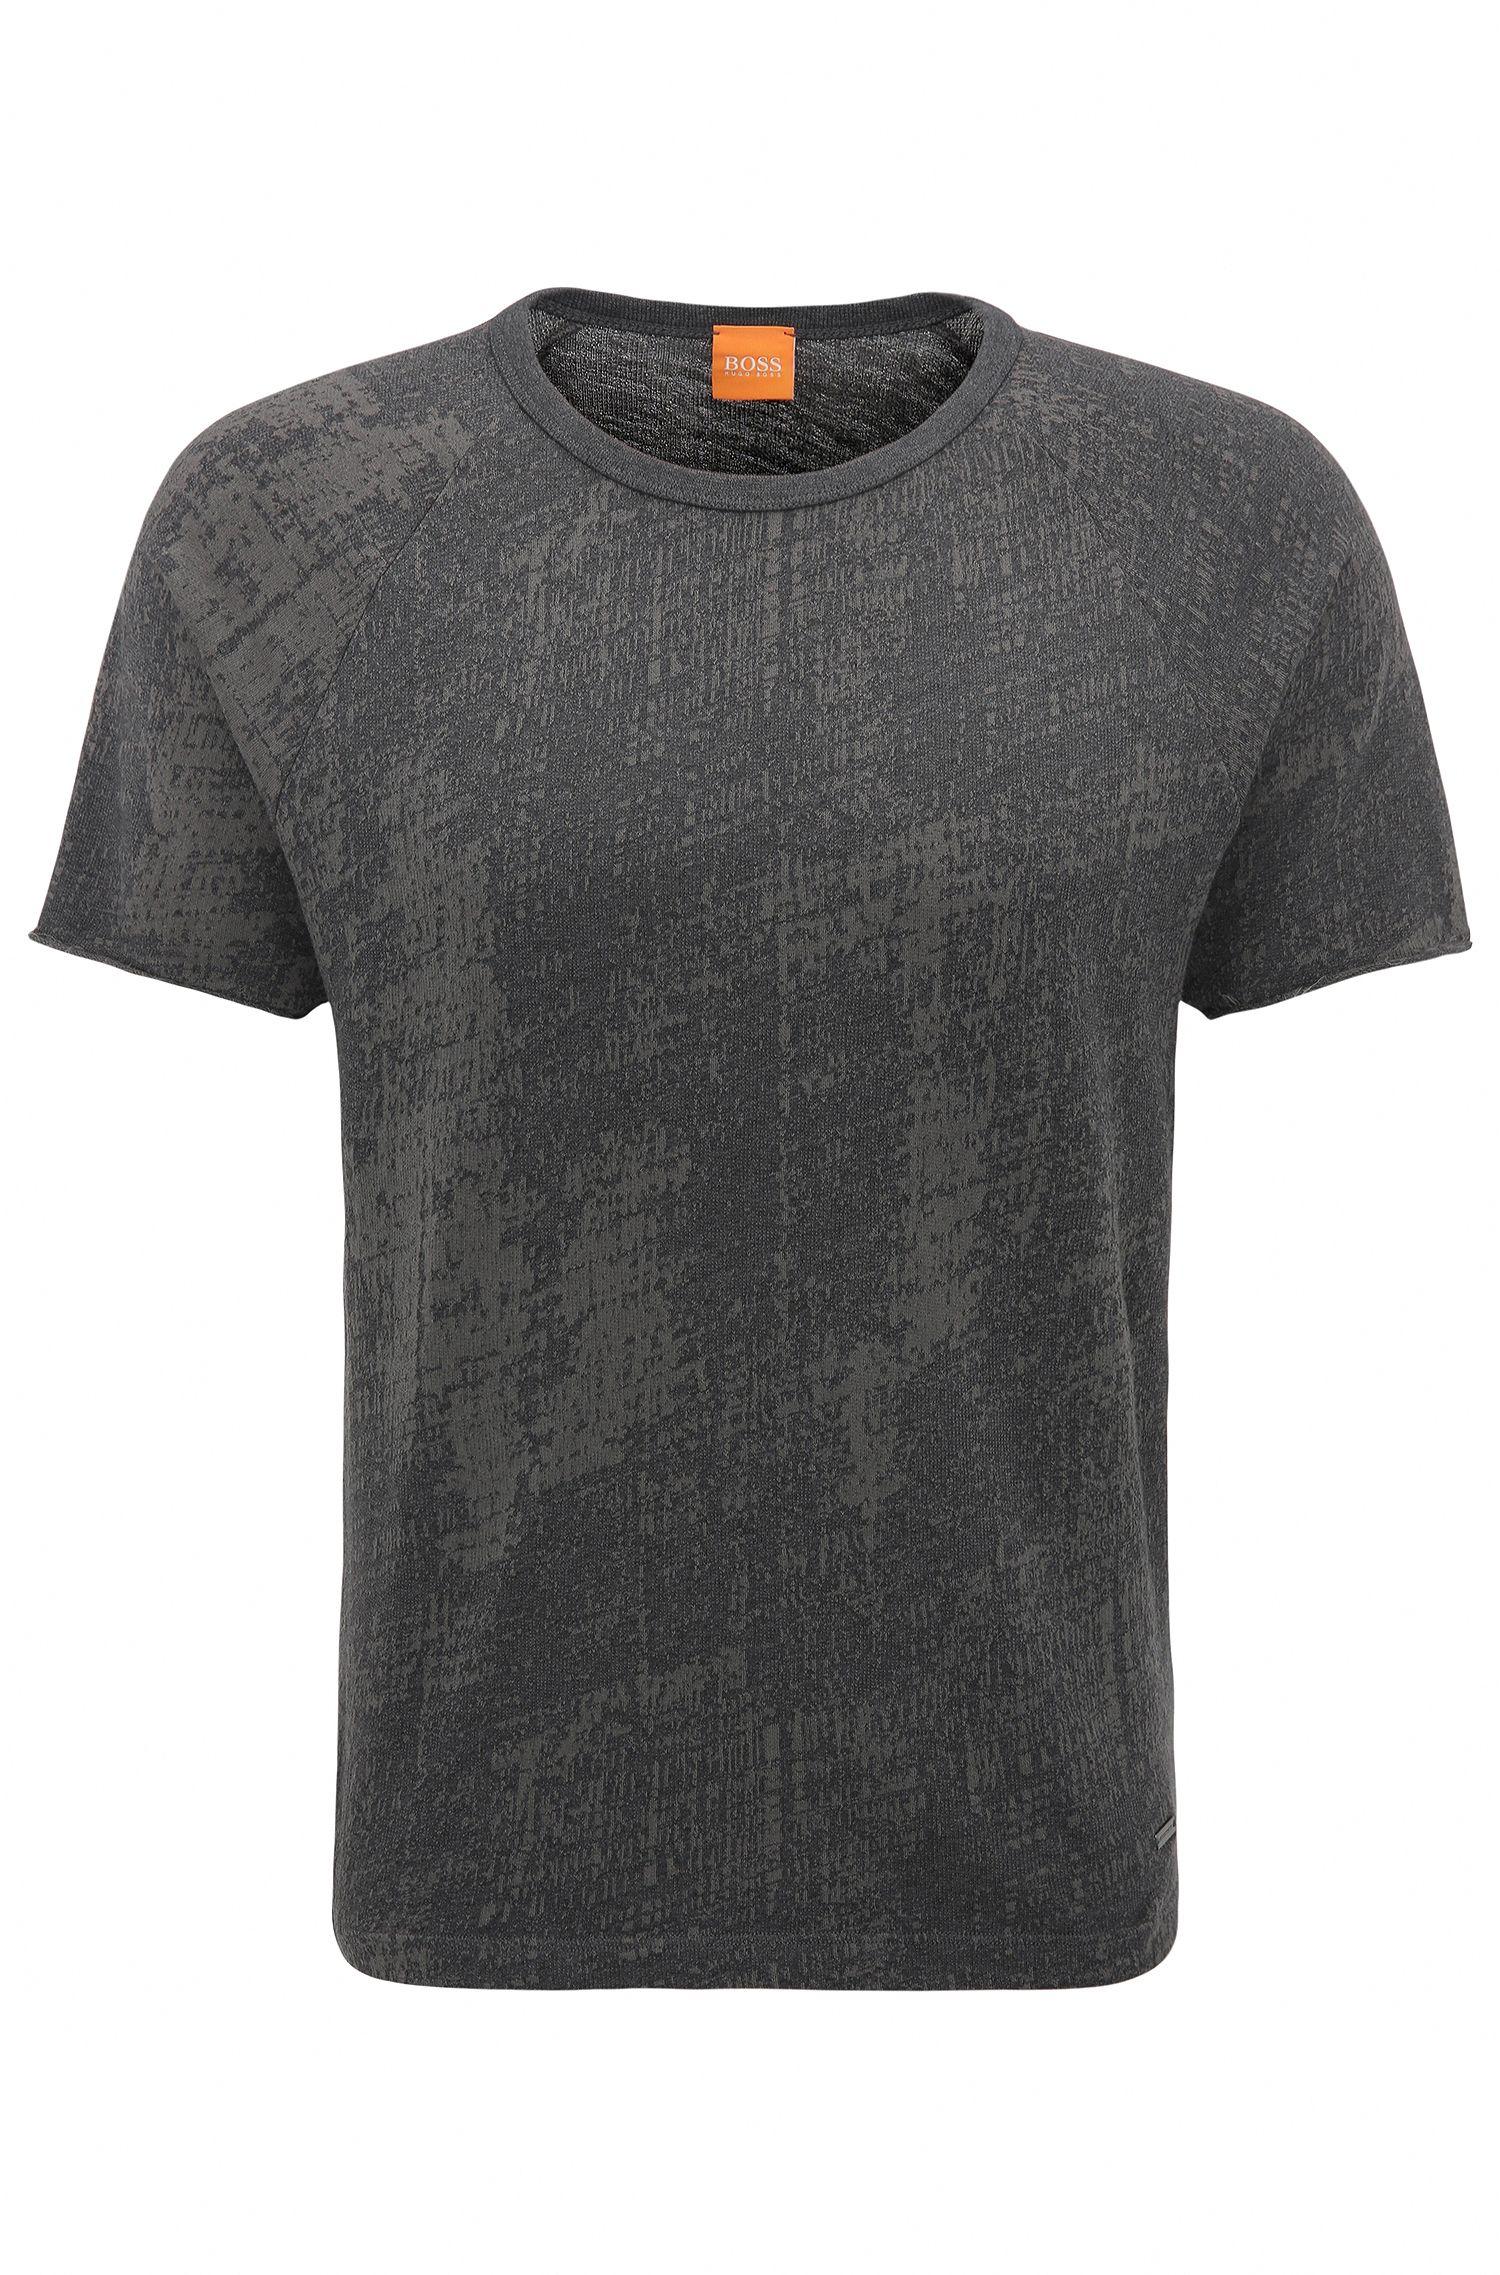 Relaxed-Fit T-Shirt aus Baumwoll-Jacquard